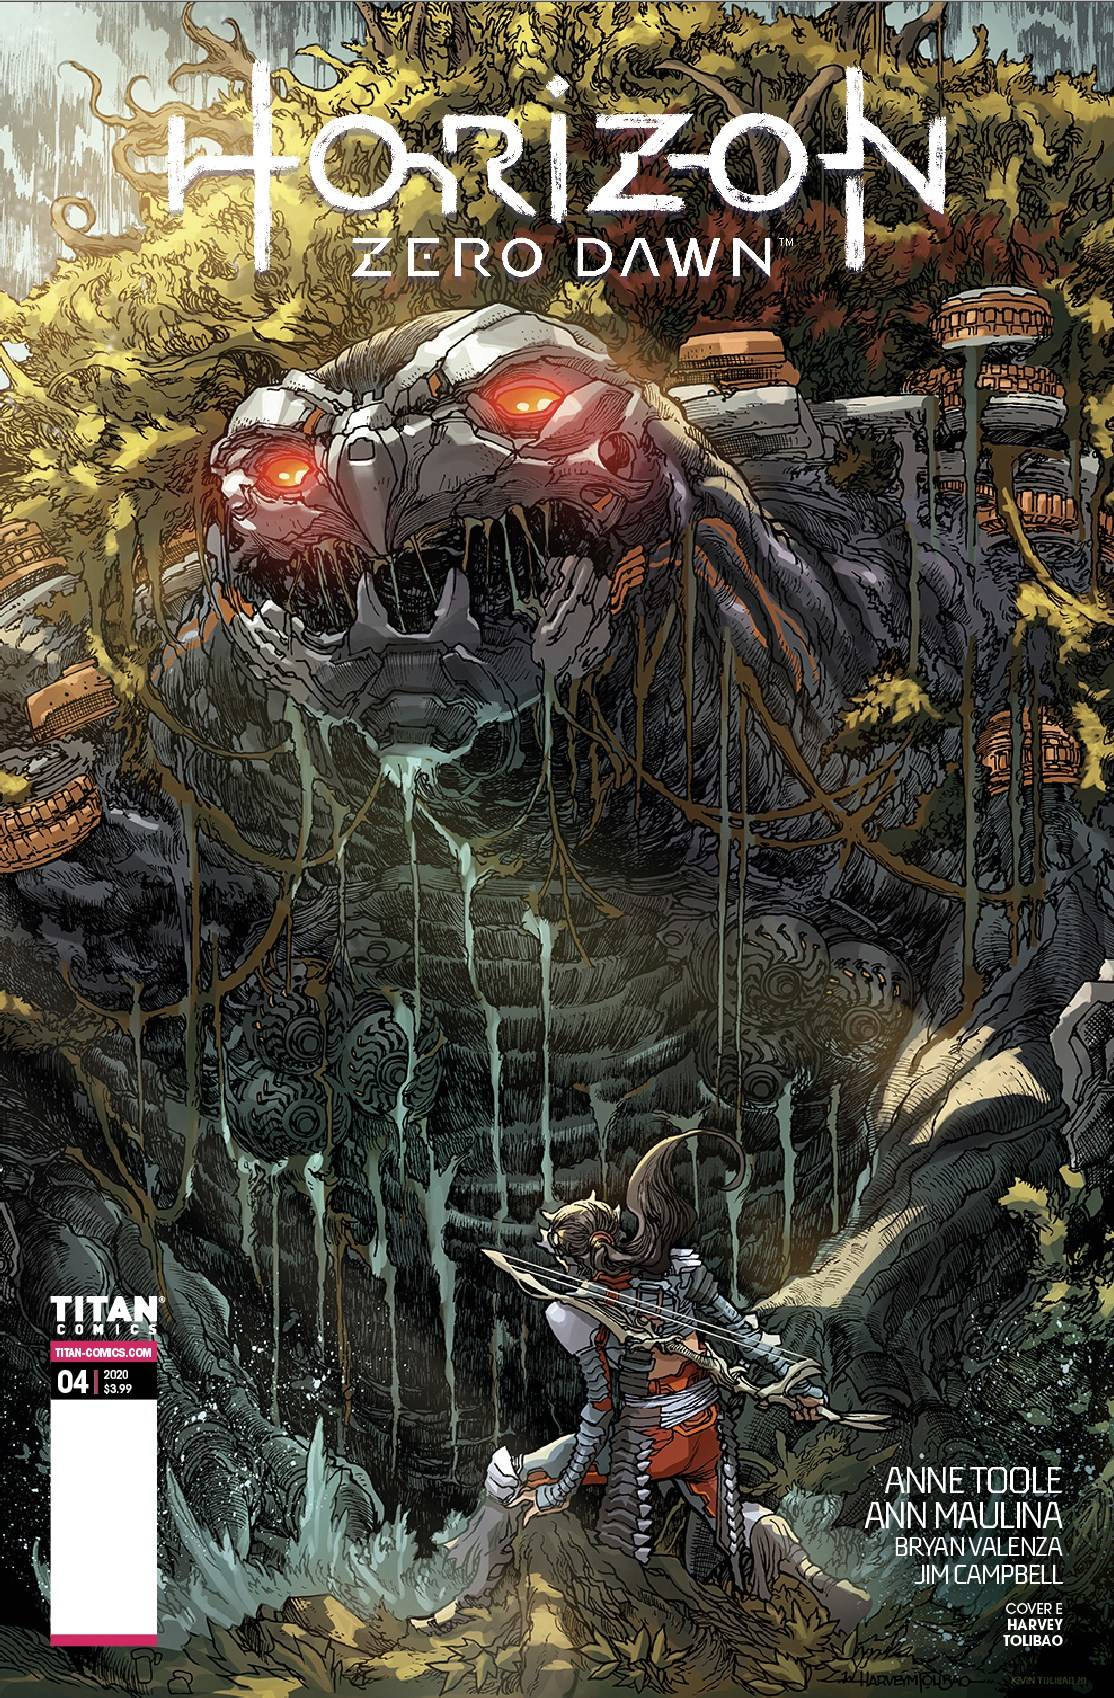 STL174135 Titan Comics Extended Forecast for 10/21/2020